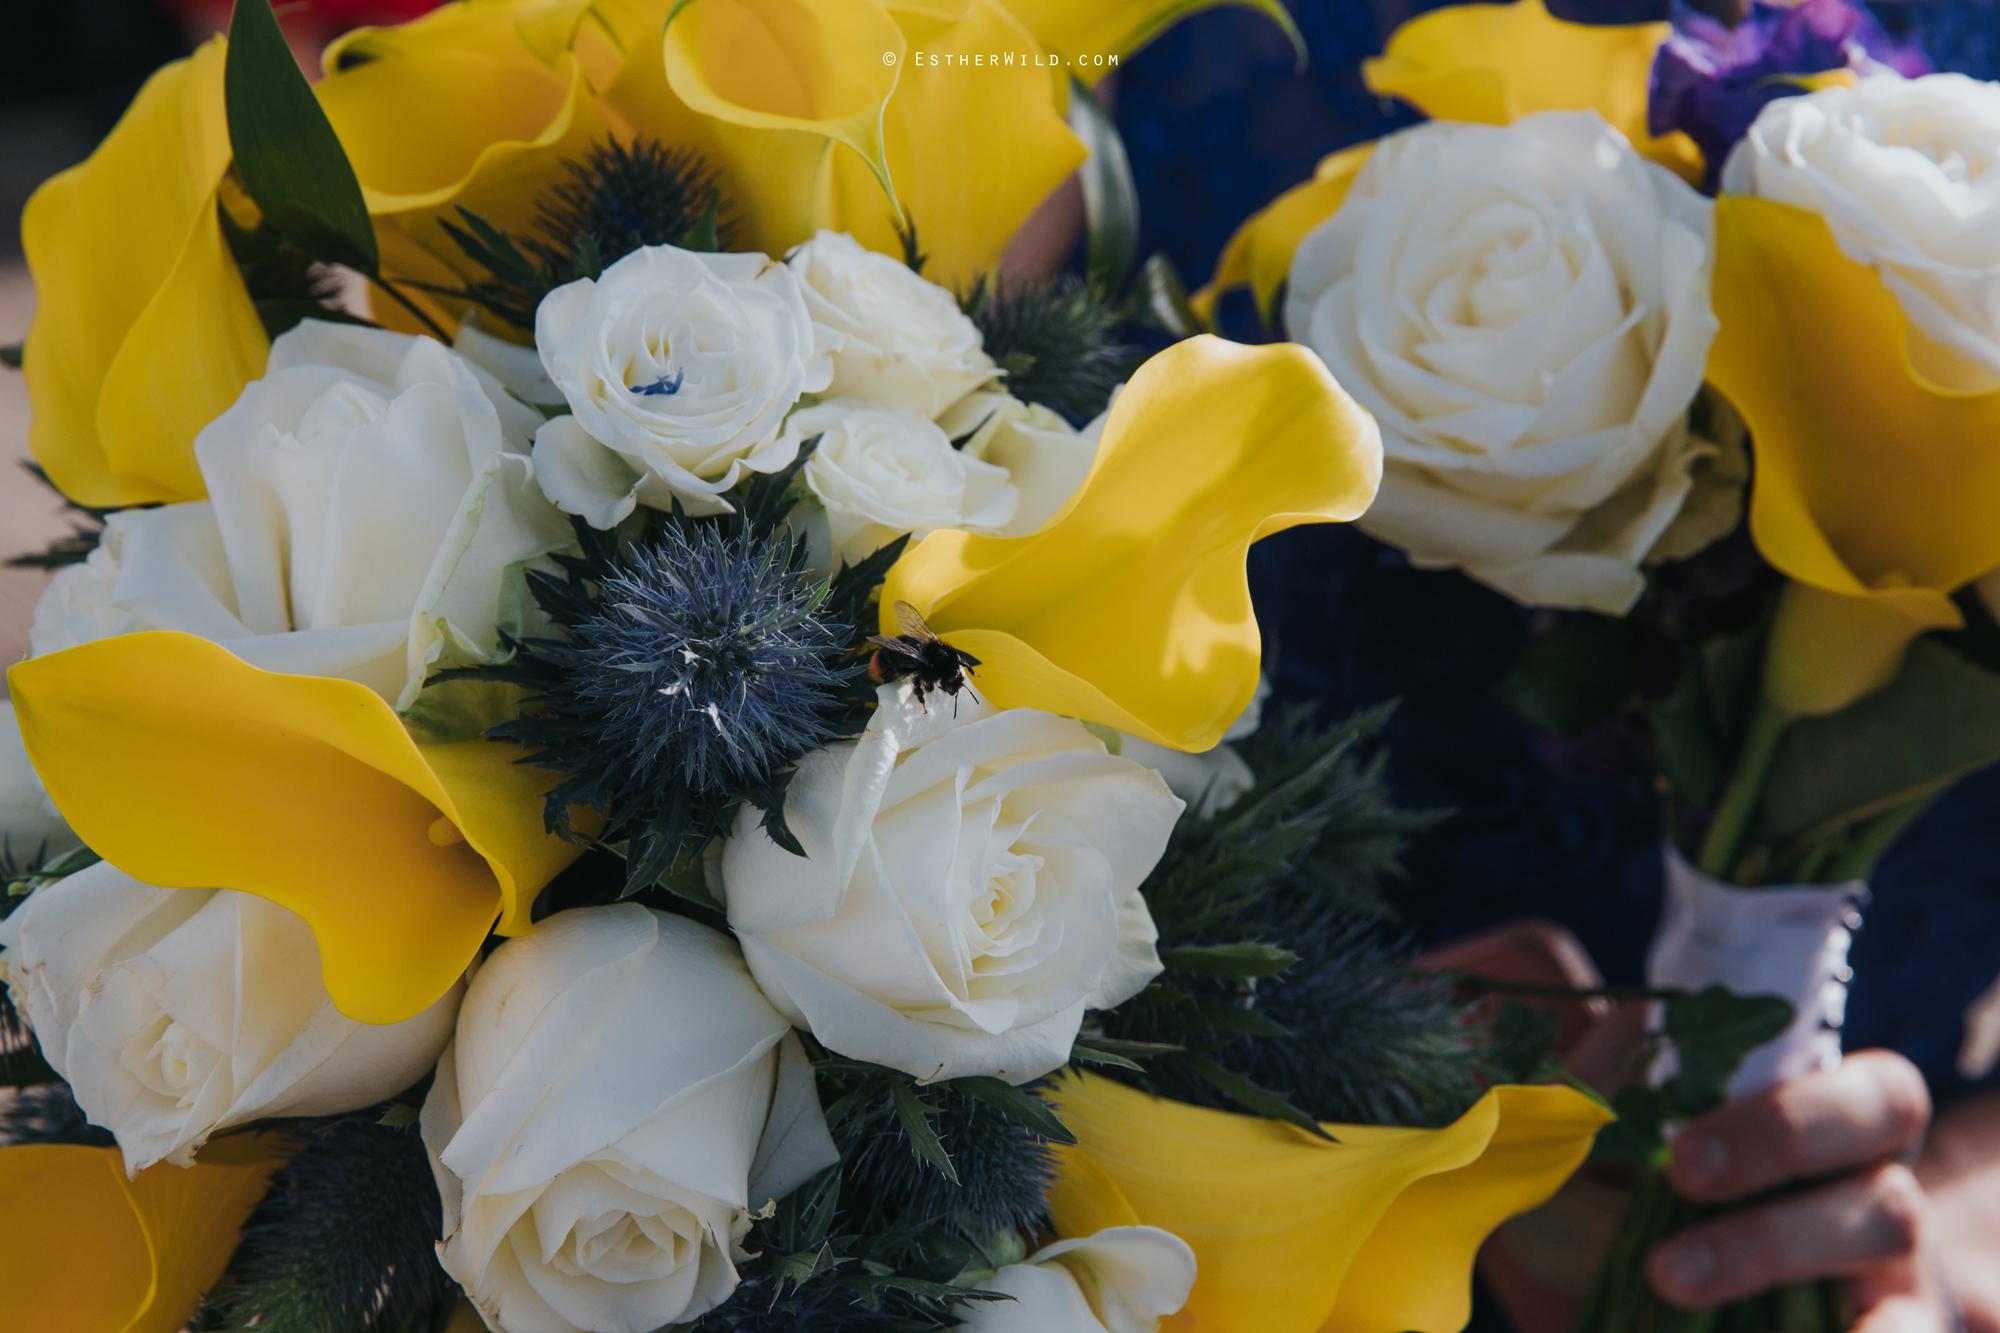 Old_Hall_Ely_Wedding_Esther_Wild_Photographer_IMG_2556.jpg